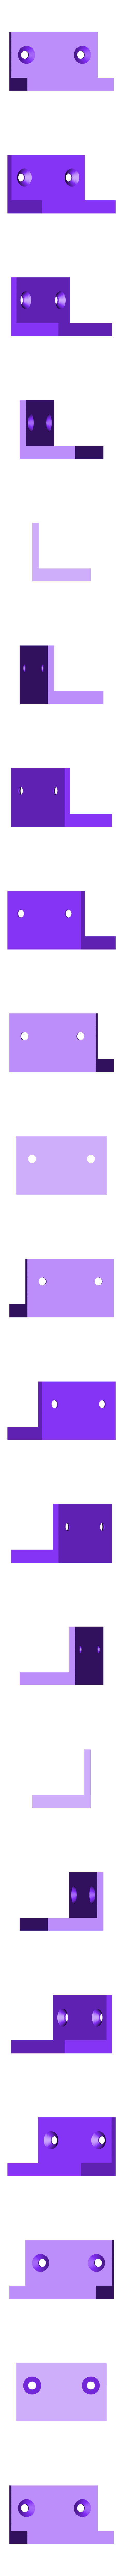 foot-bracket.stl Download free STL file USB Foot Switch Controller • Model to 3D print, Adafruit